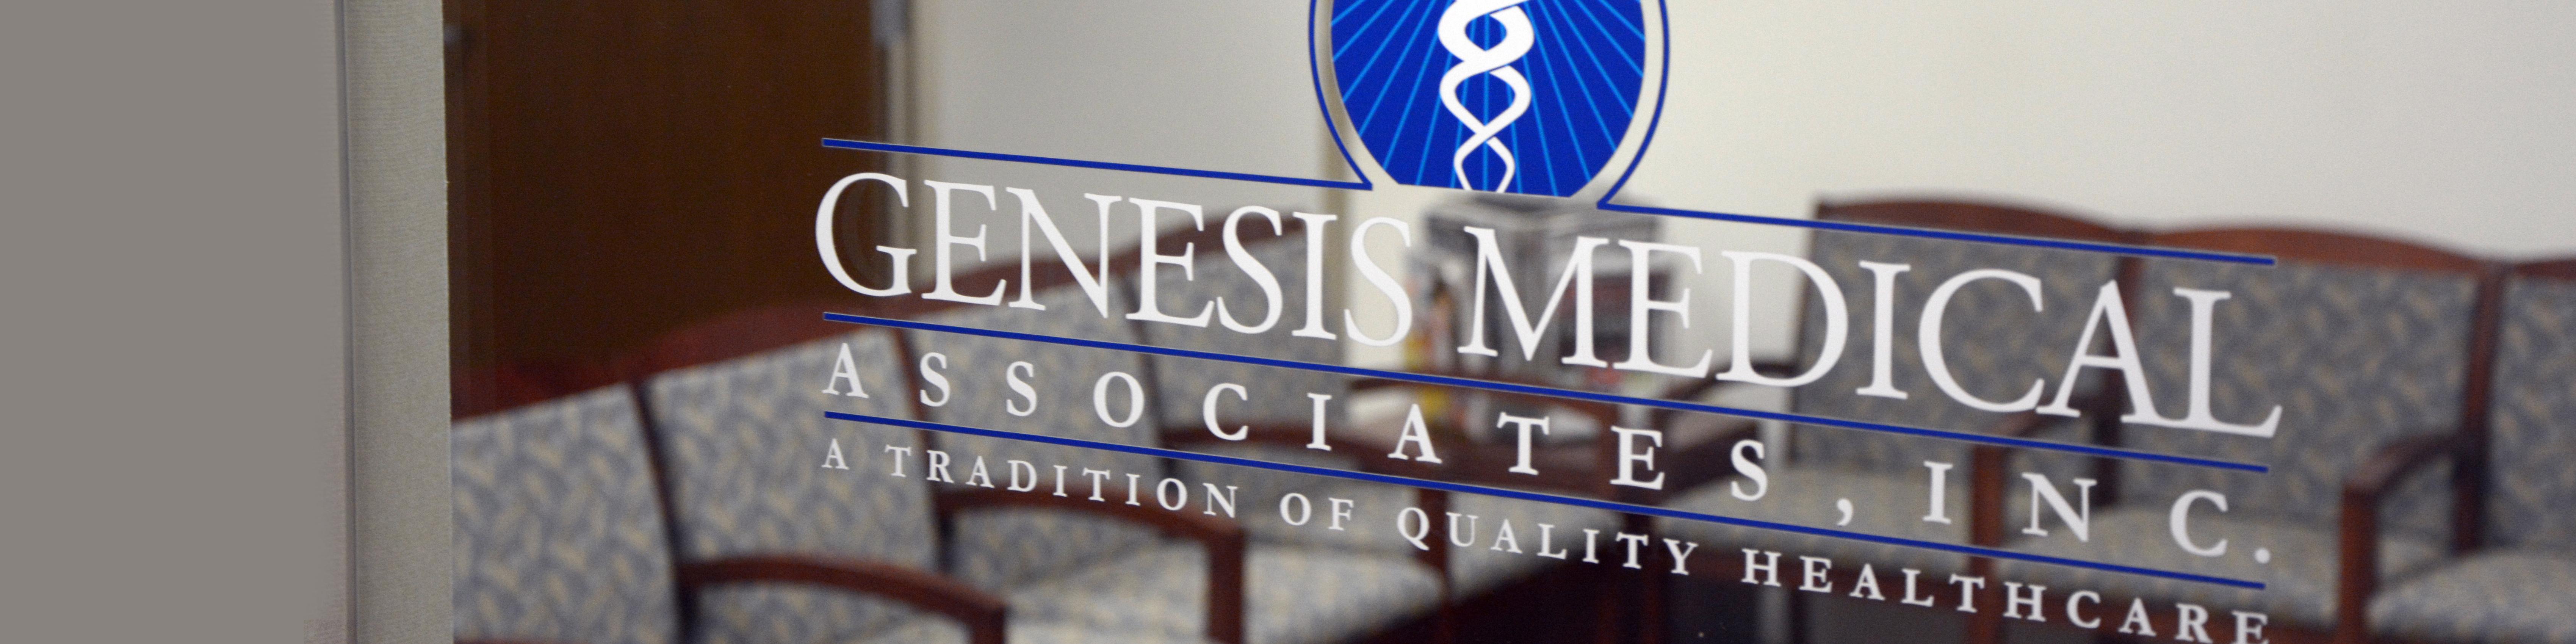 Genesis Medical Associates, Inc. Banner